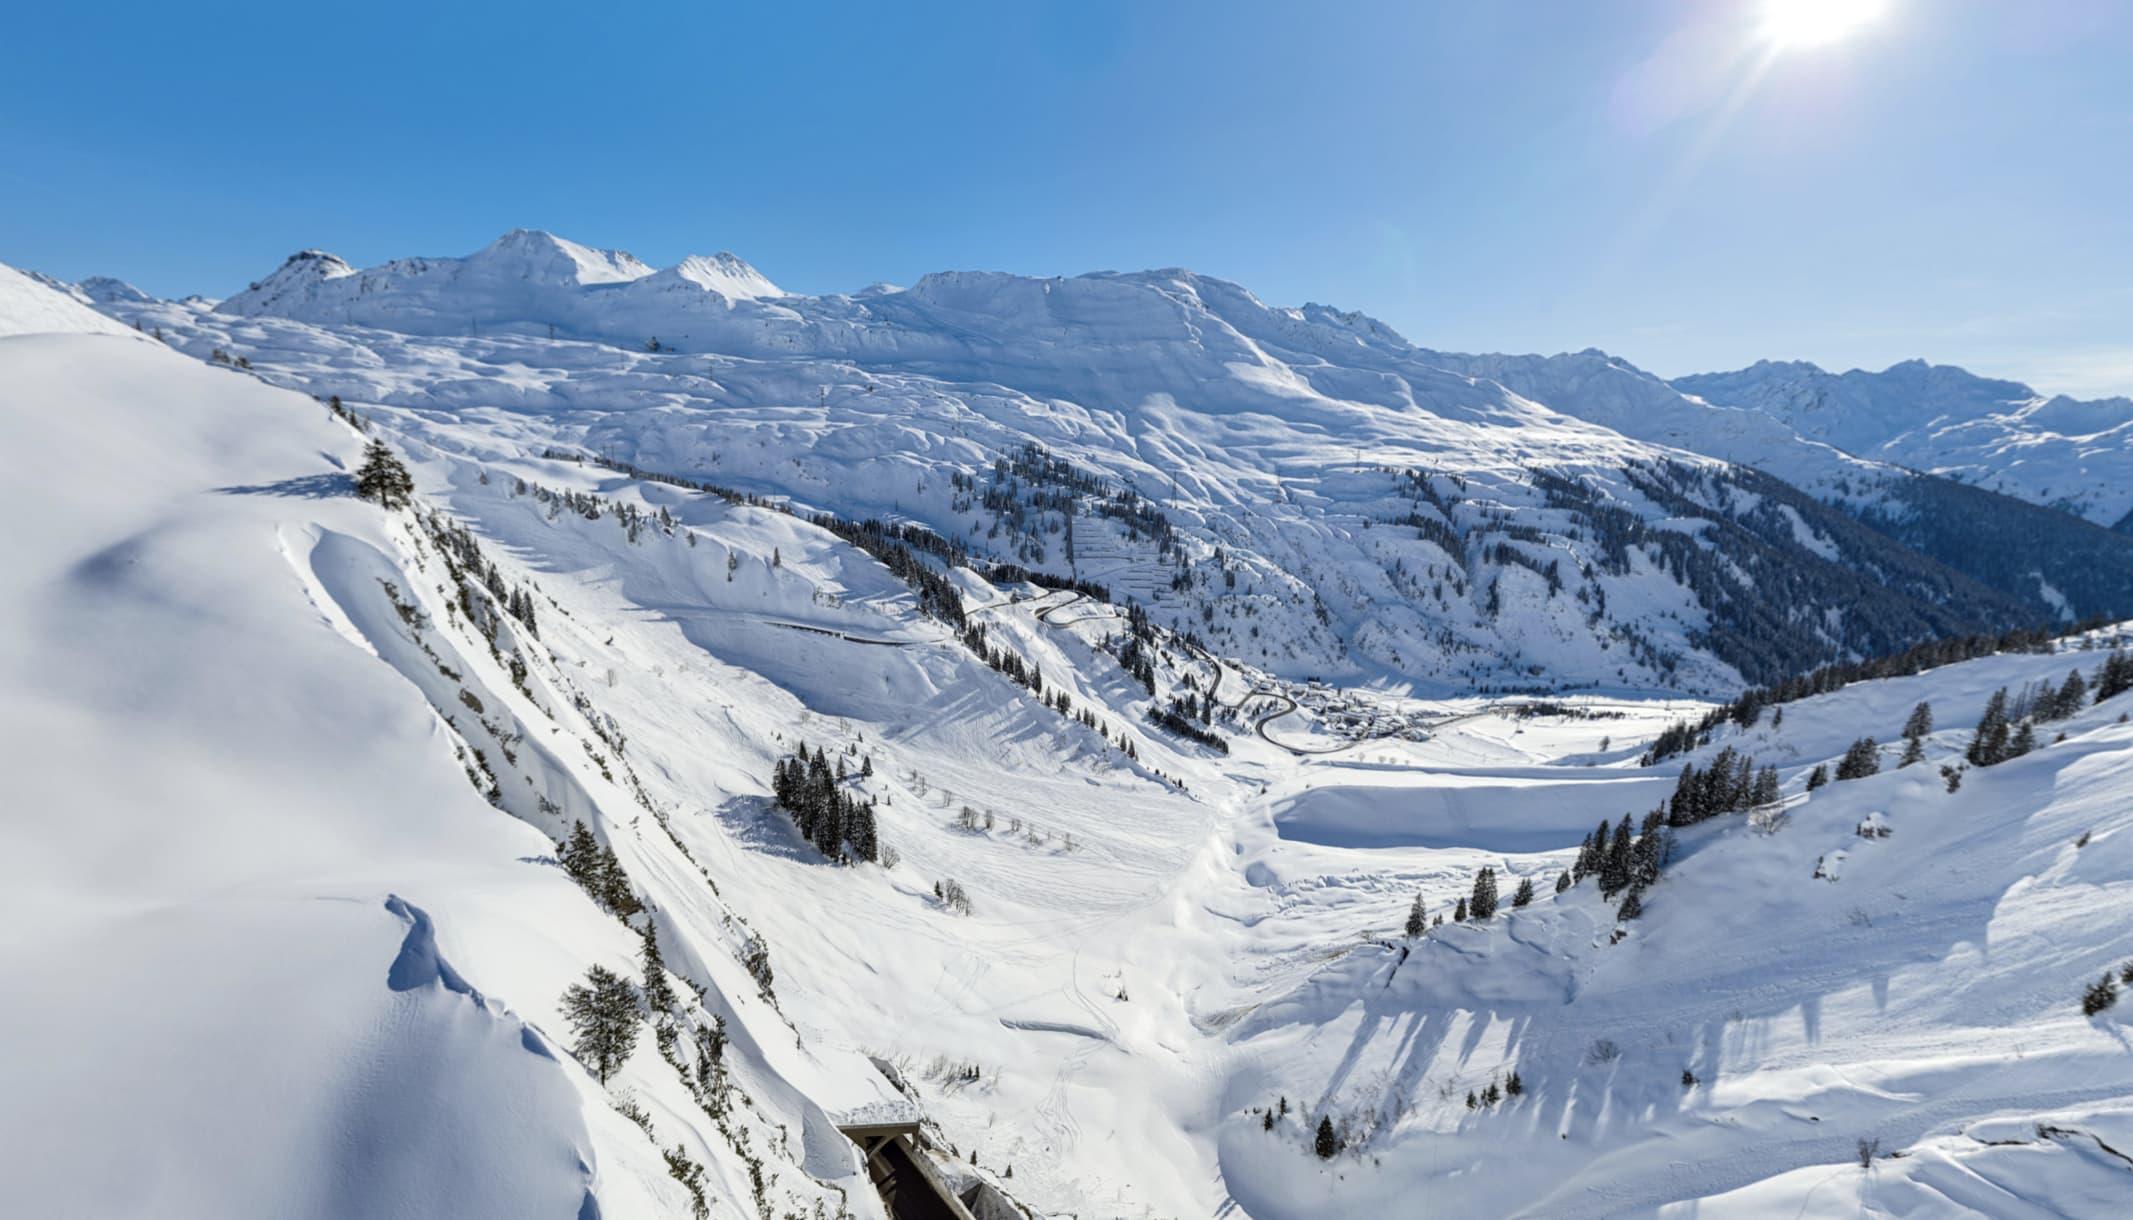 stuben-panorama-view-presspage-a-1-scaled